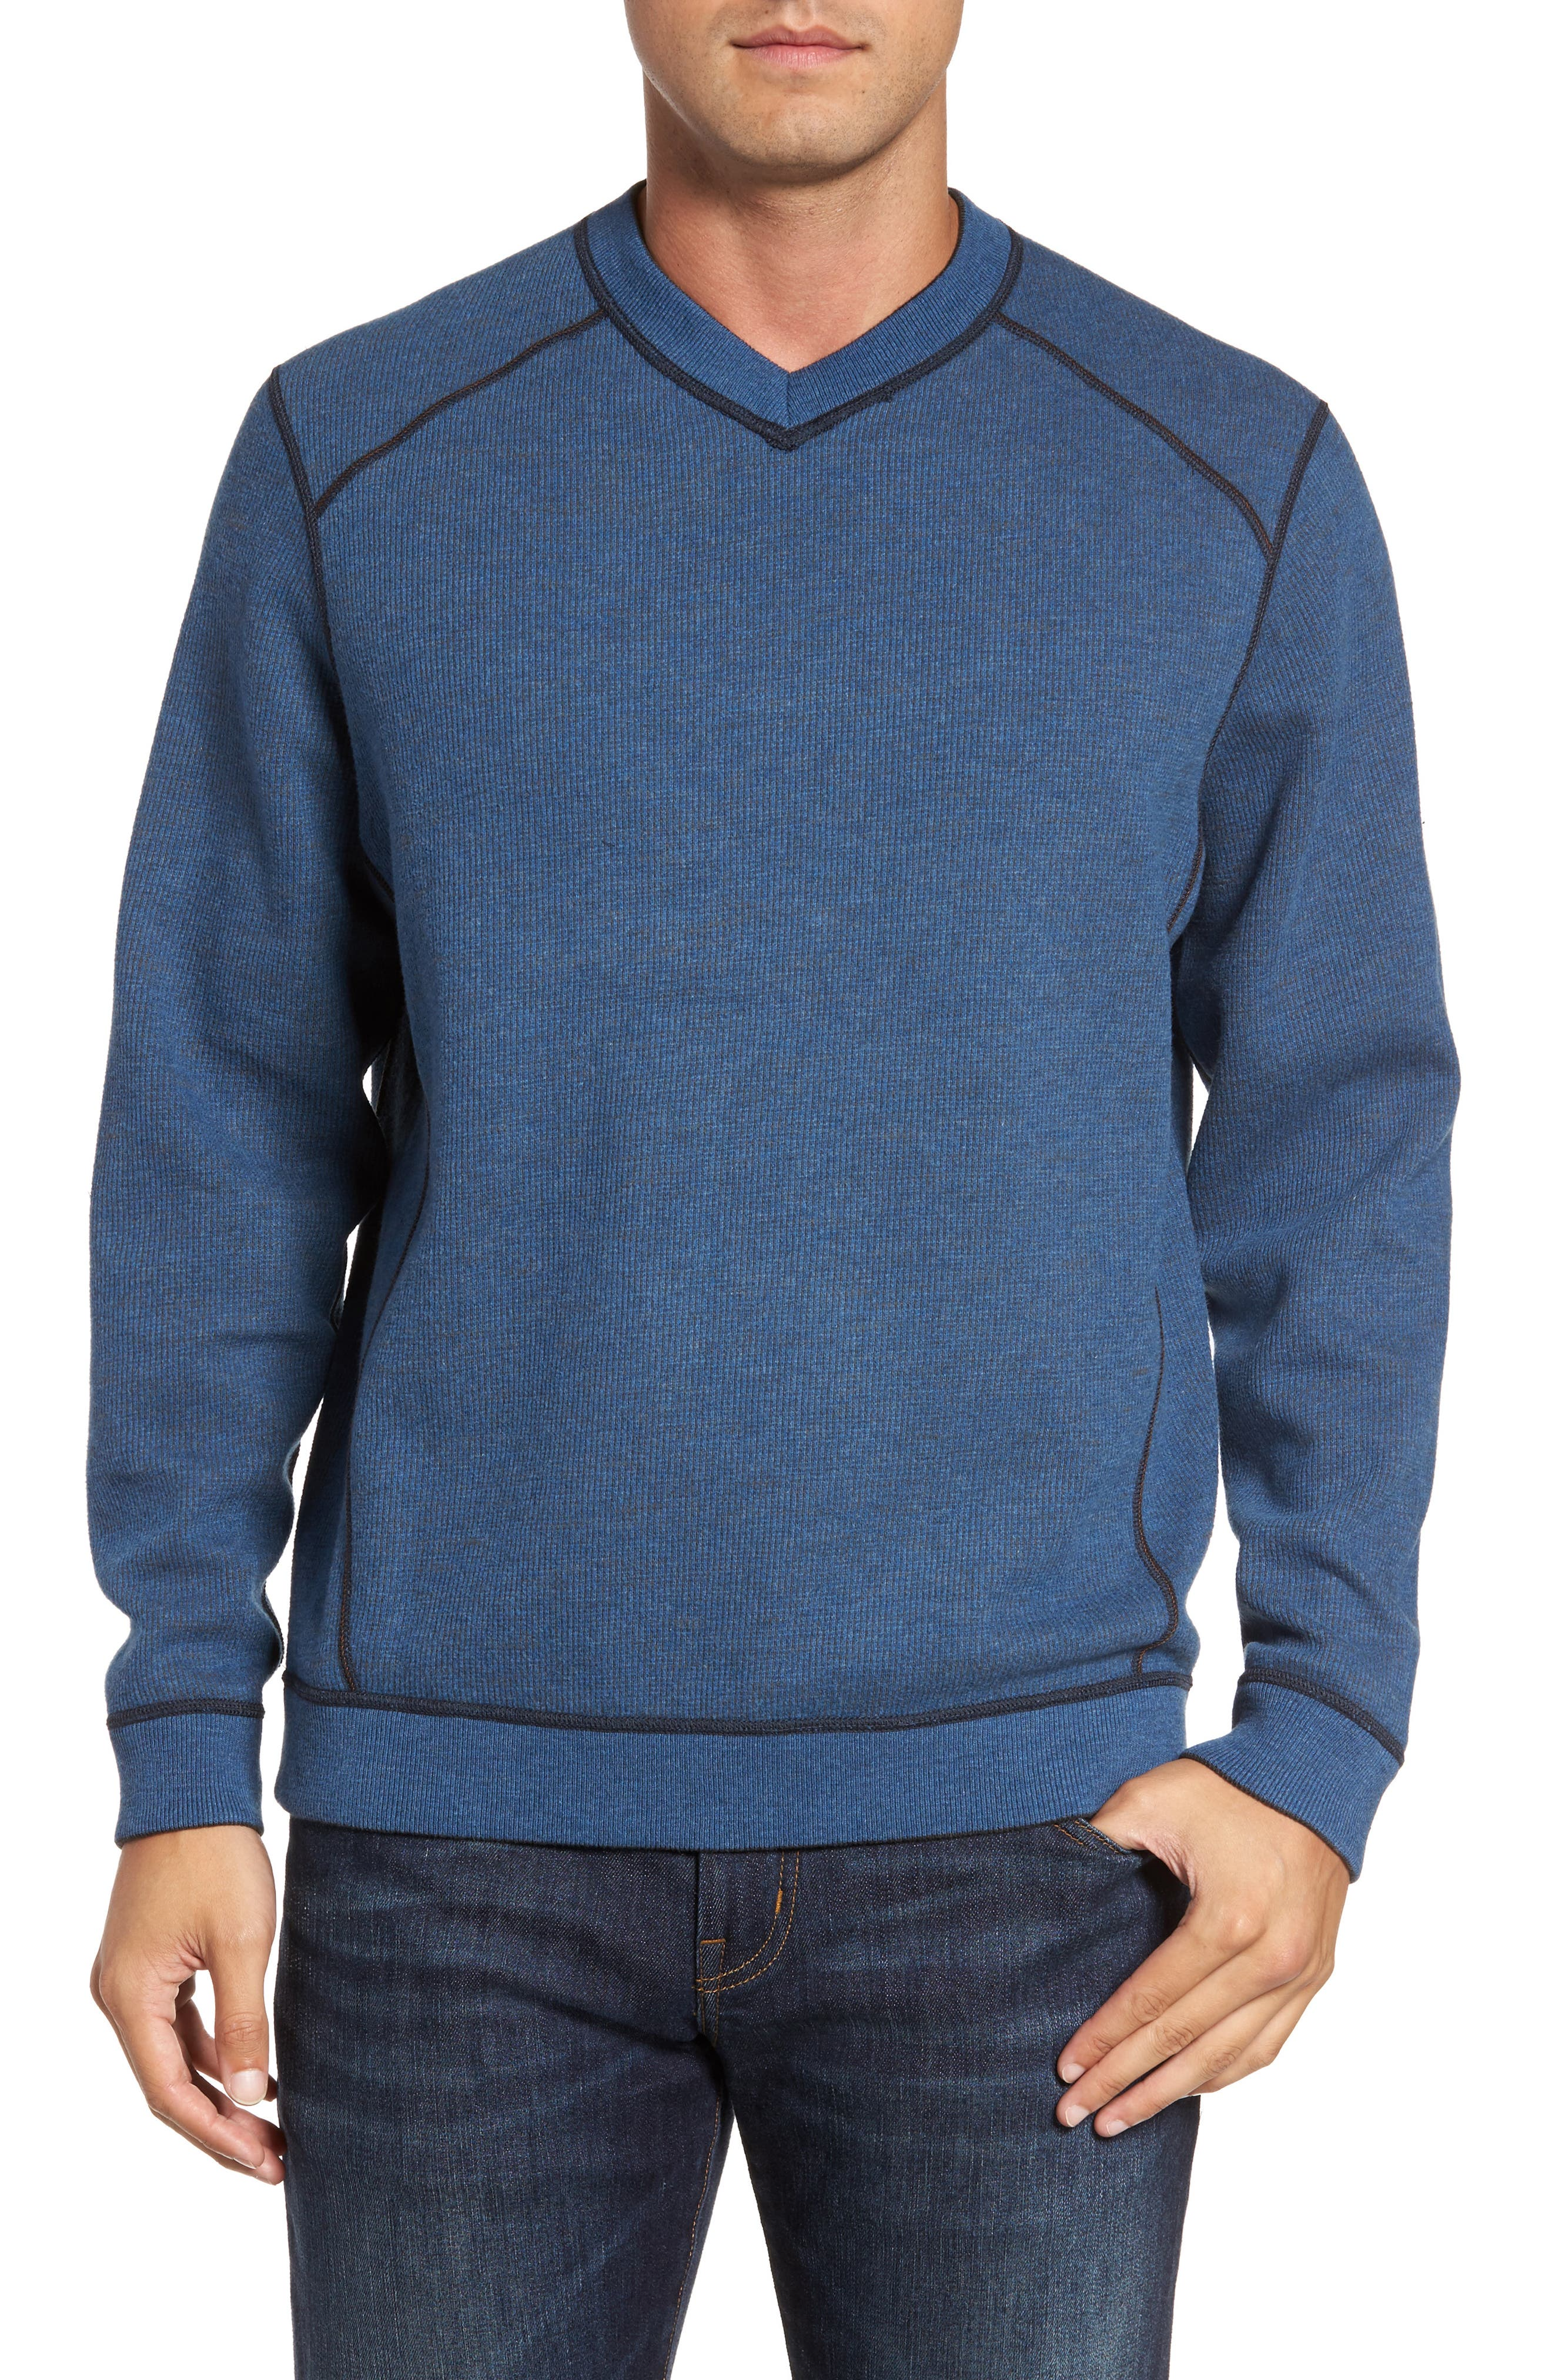 Flipside Pro Reversible Sweatshirt,                             Alternate thumbnail 4, color,                             001